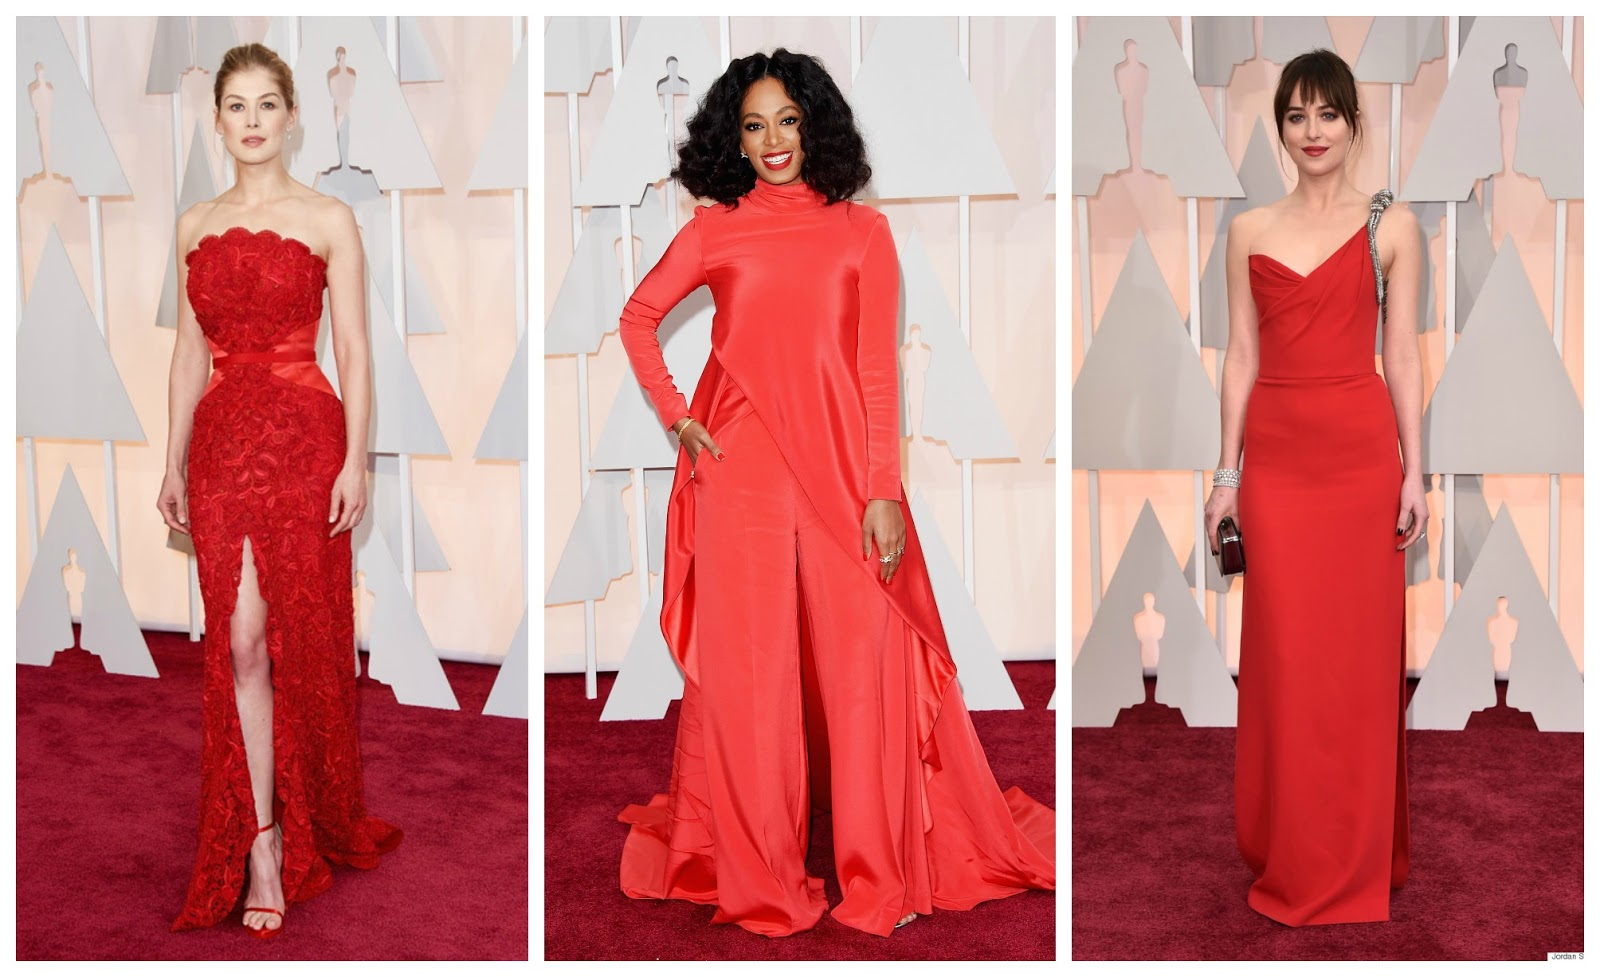 OSCARS 2015 Red Carpet Fashion